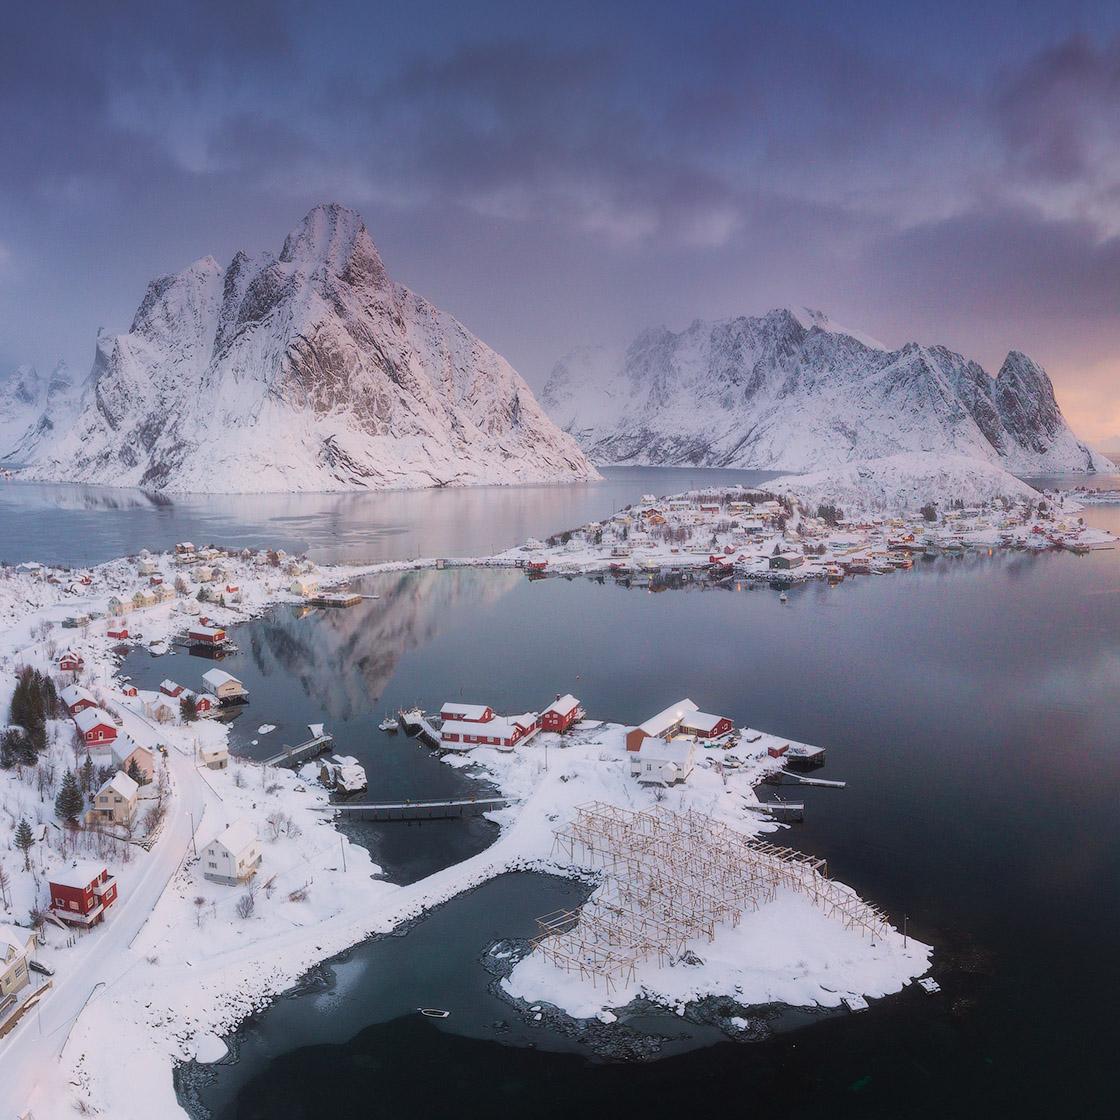 Lofoten Winter Photography Workshop - day 2